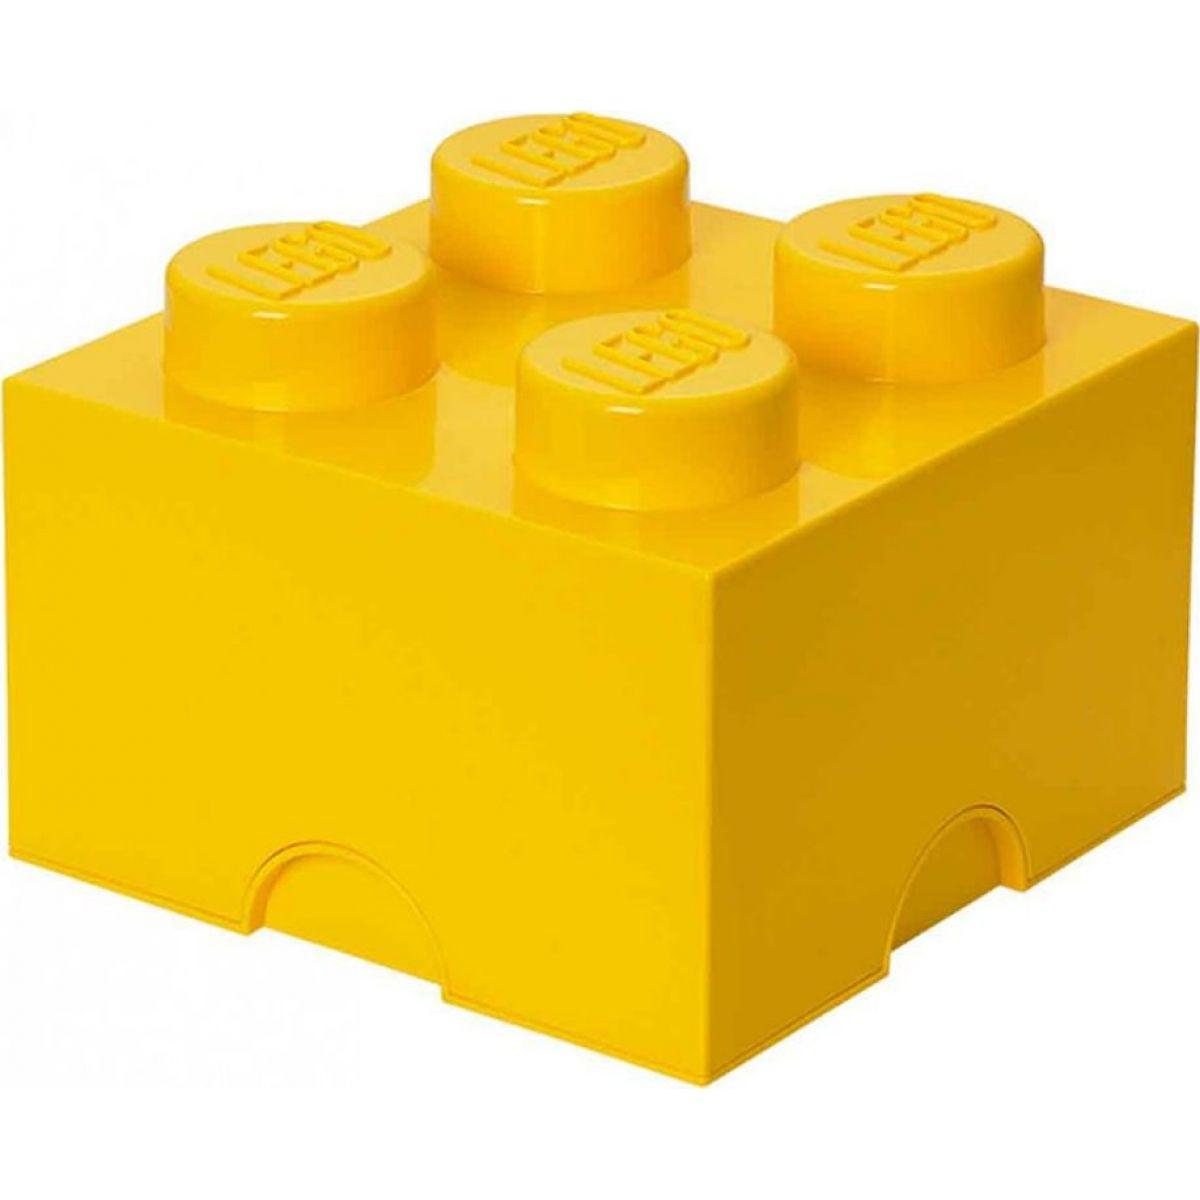 LEGO Úložný box 25x25x18cm Žlutá